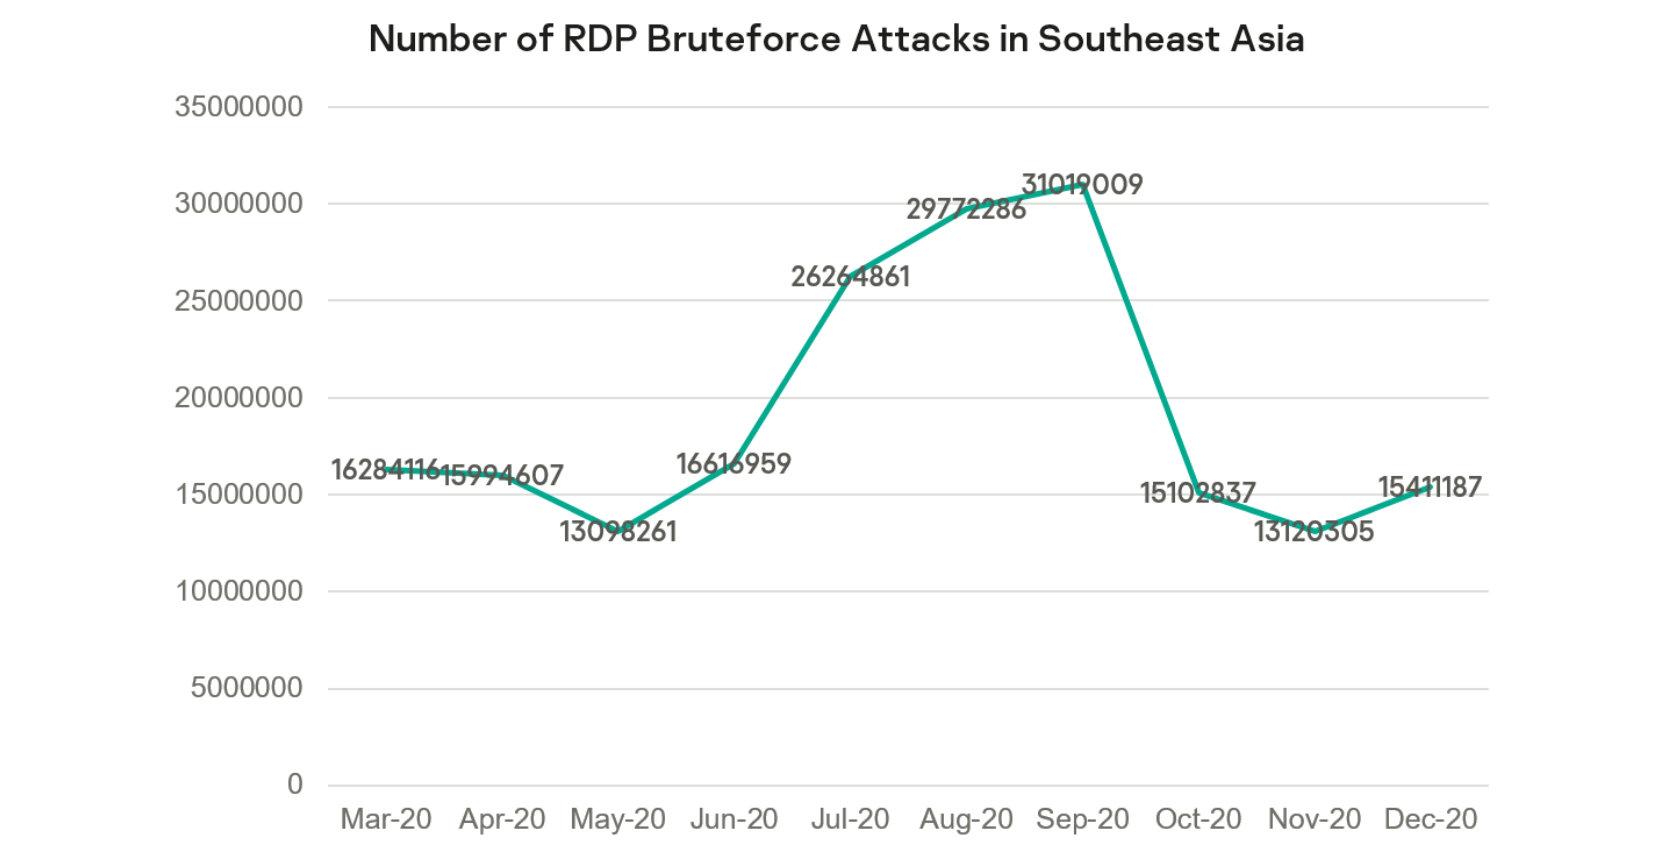 Number of RDP BruteForce Attacks in SEA